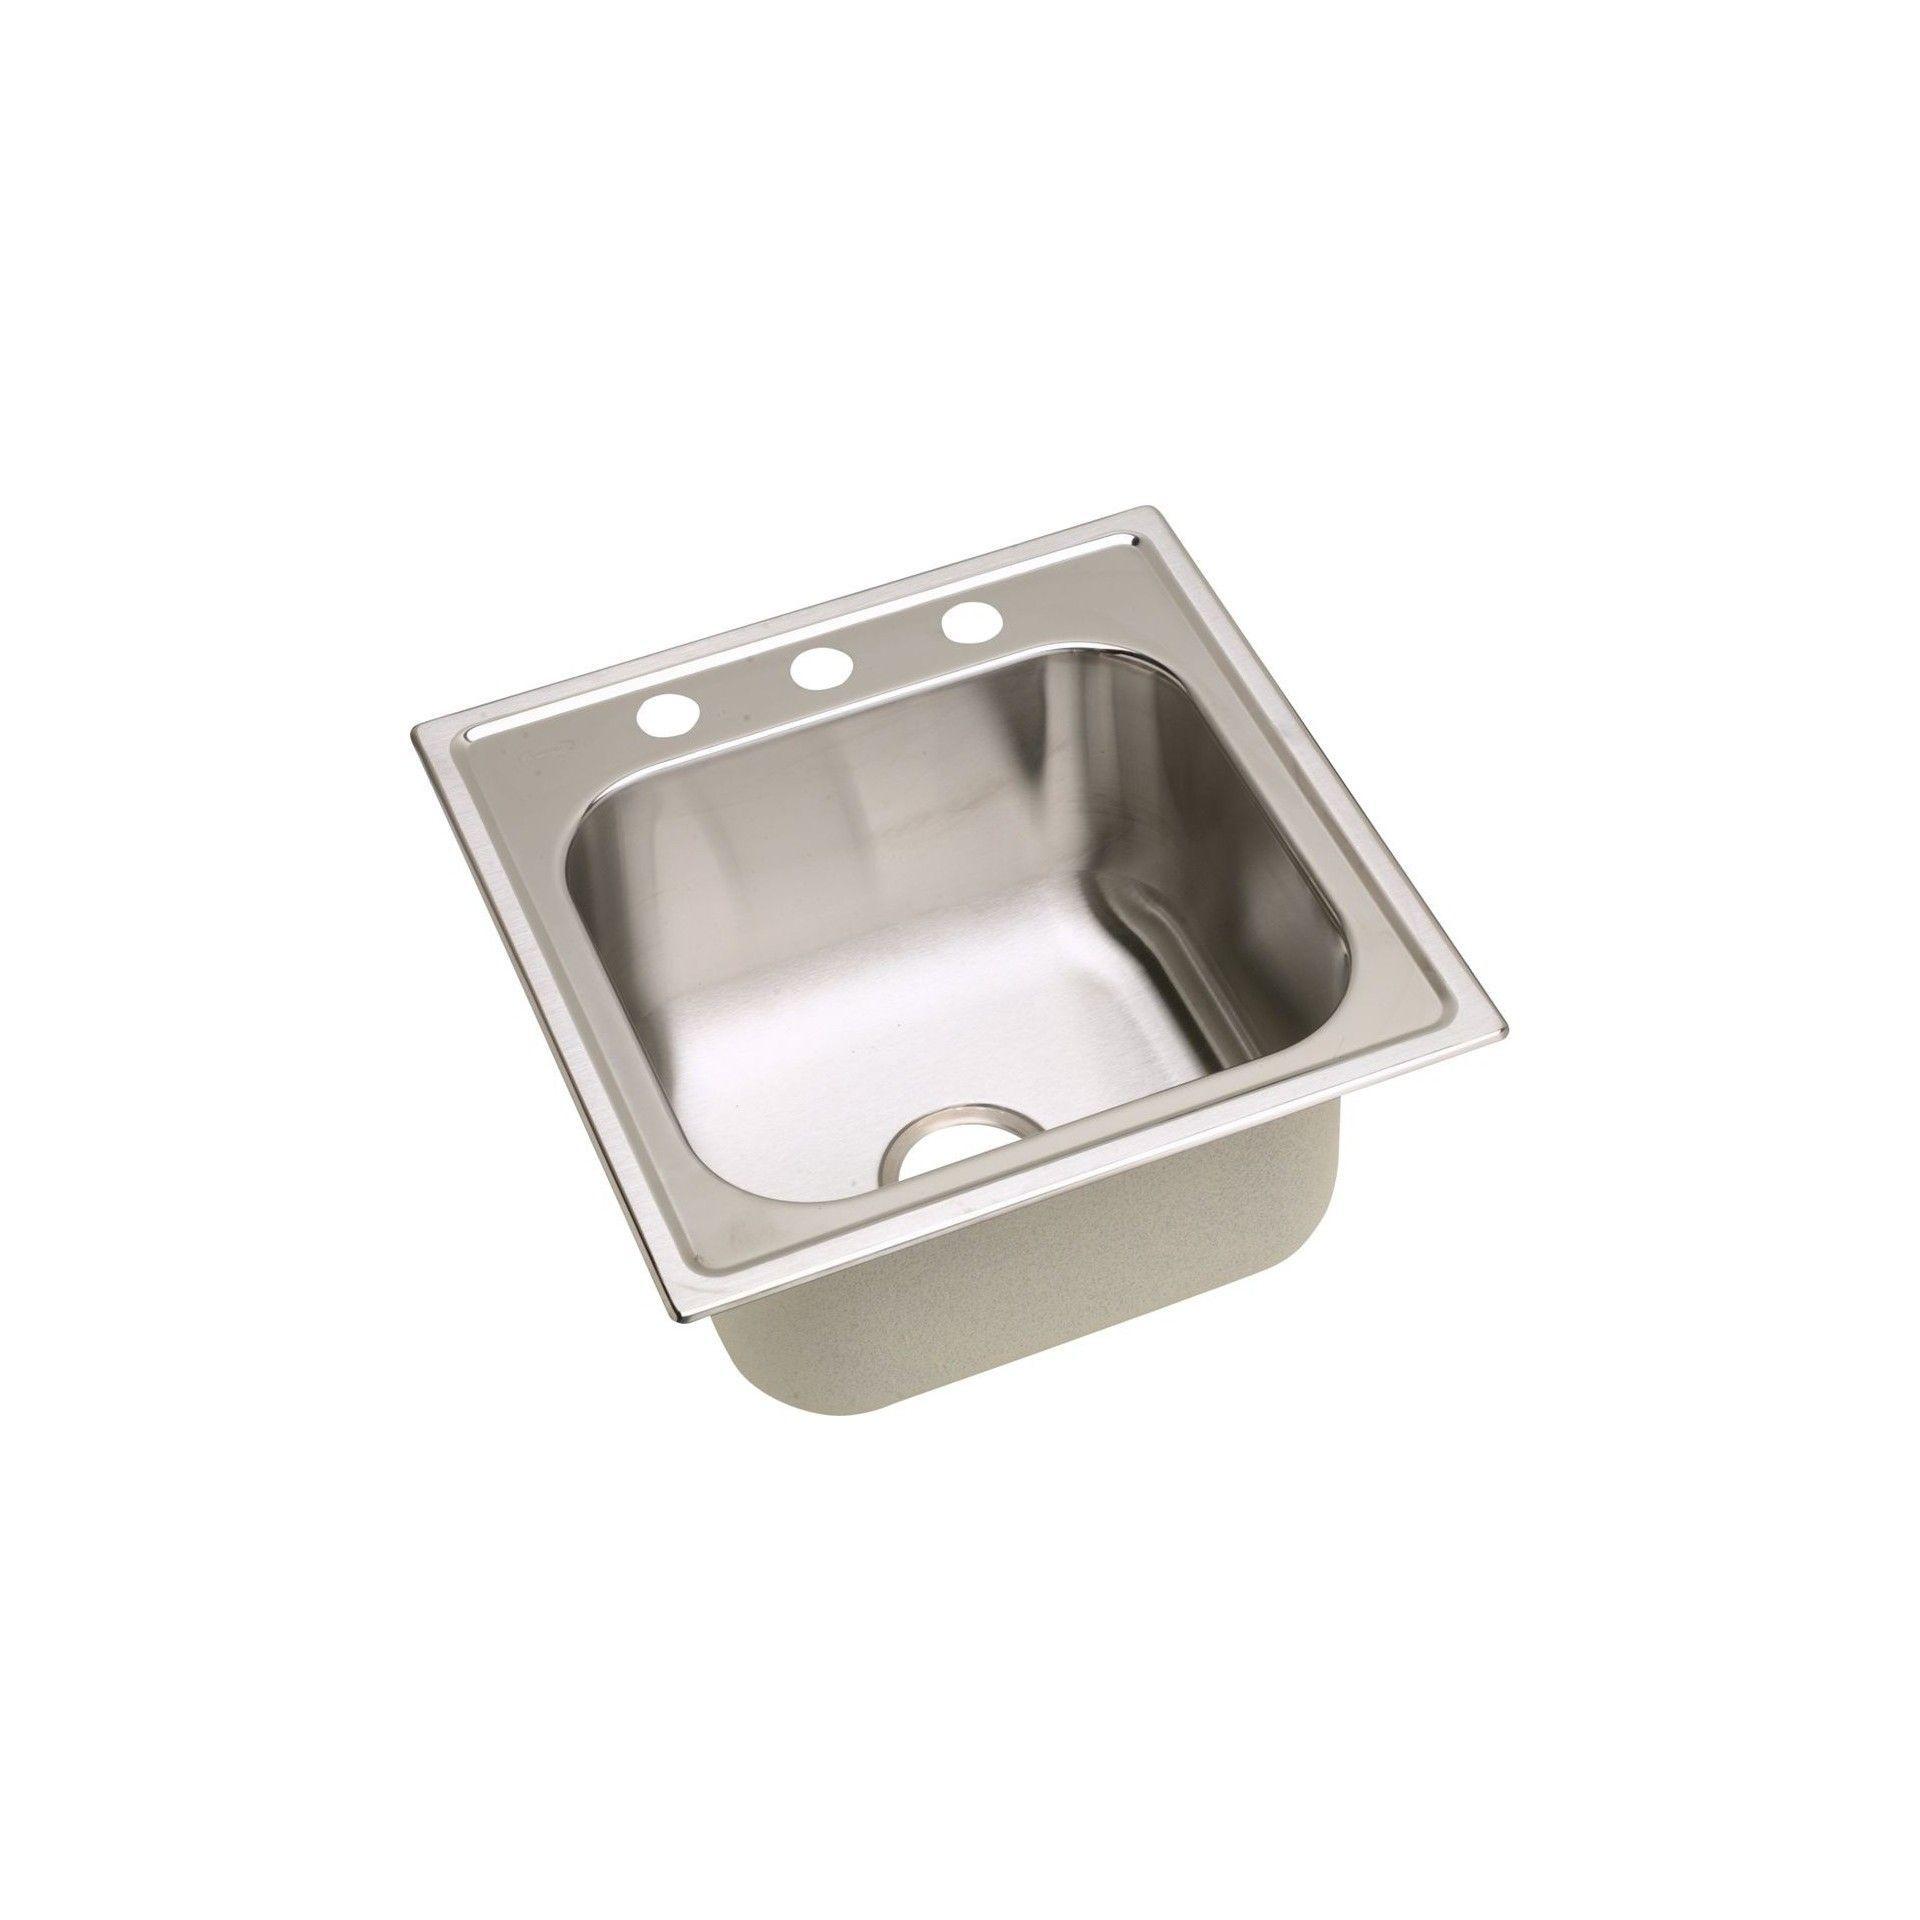 Elkay Dayton Stainless Steel 20 X 20 X 10 1 8 Single Bowl Top